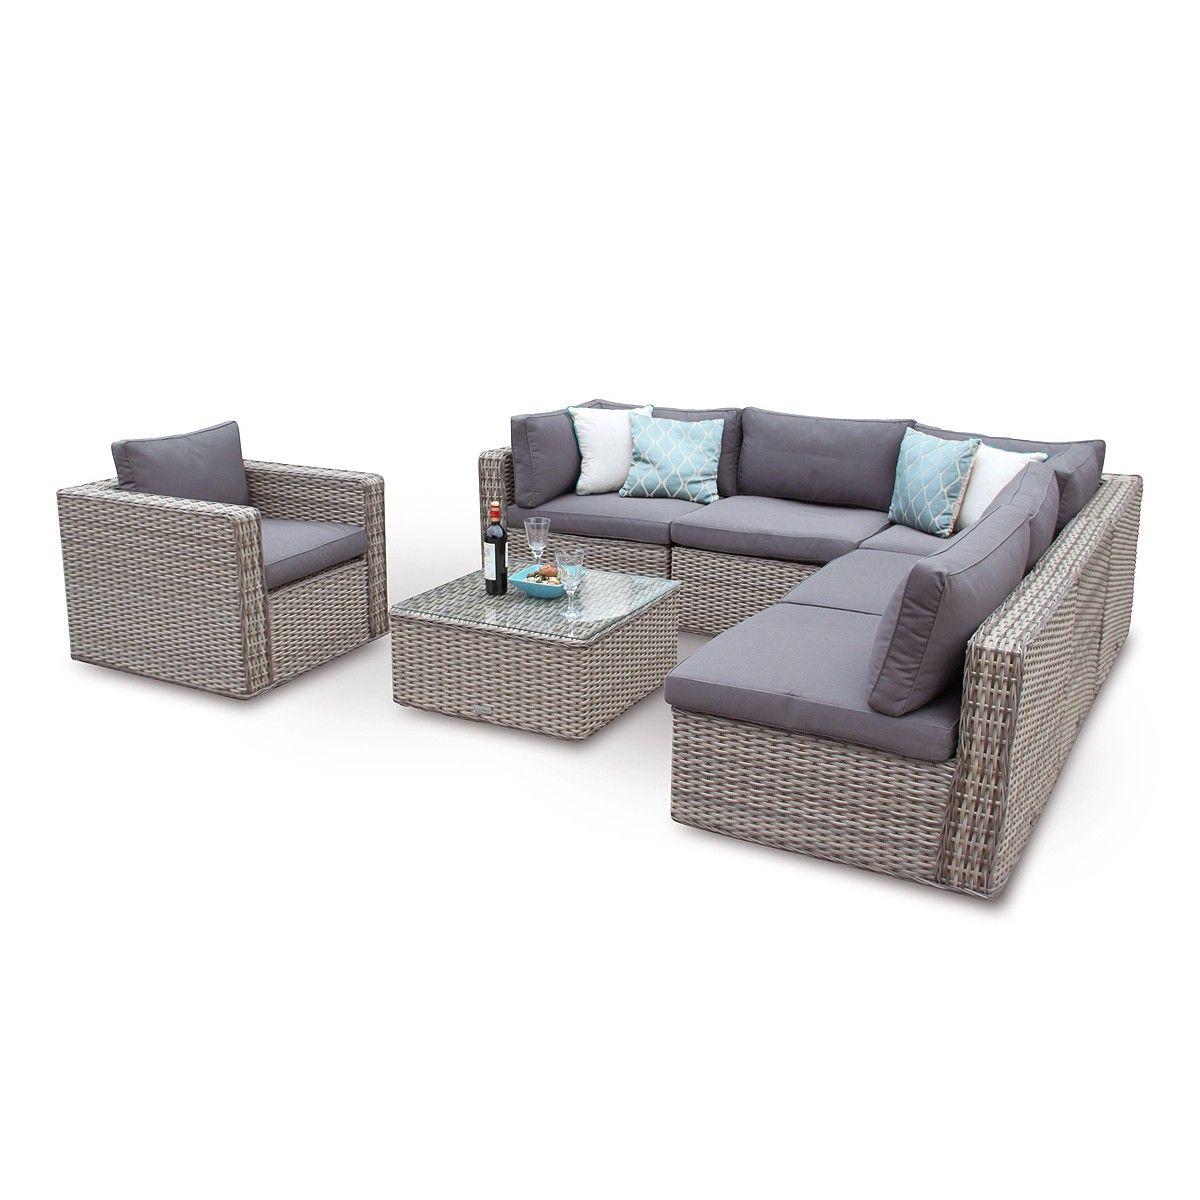 Ascot Rattan Modular Corner Sofa Daybed Patio Set - Natural ...